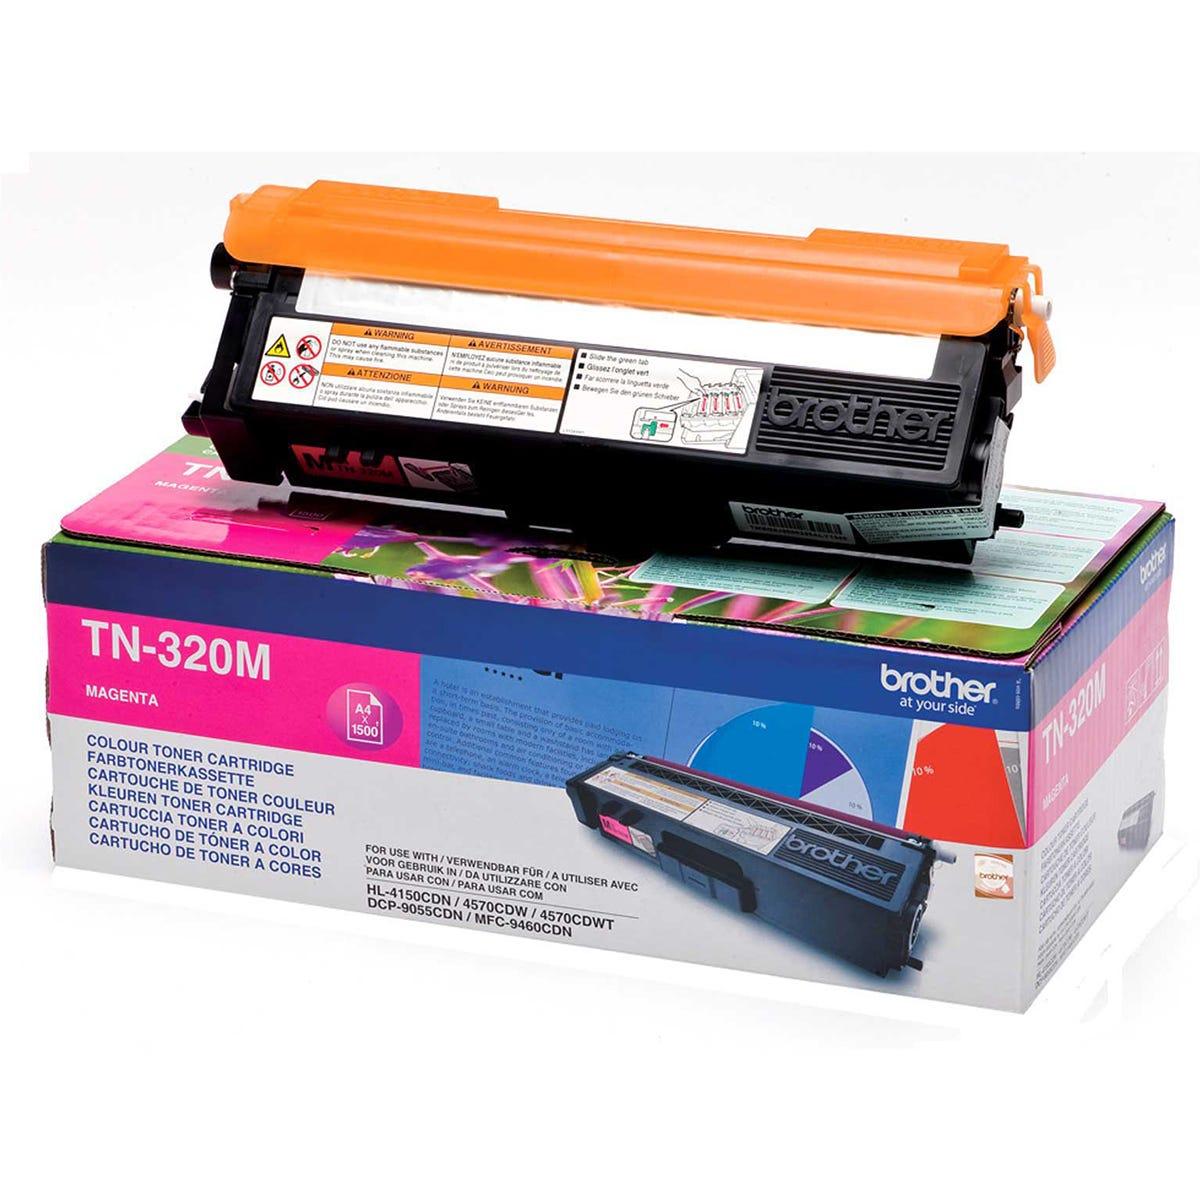 Brother TN 320 Toner Ink Printer Cartridge Magenta, Magenta